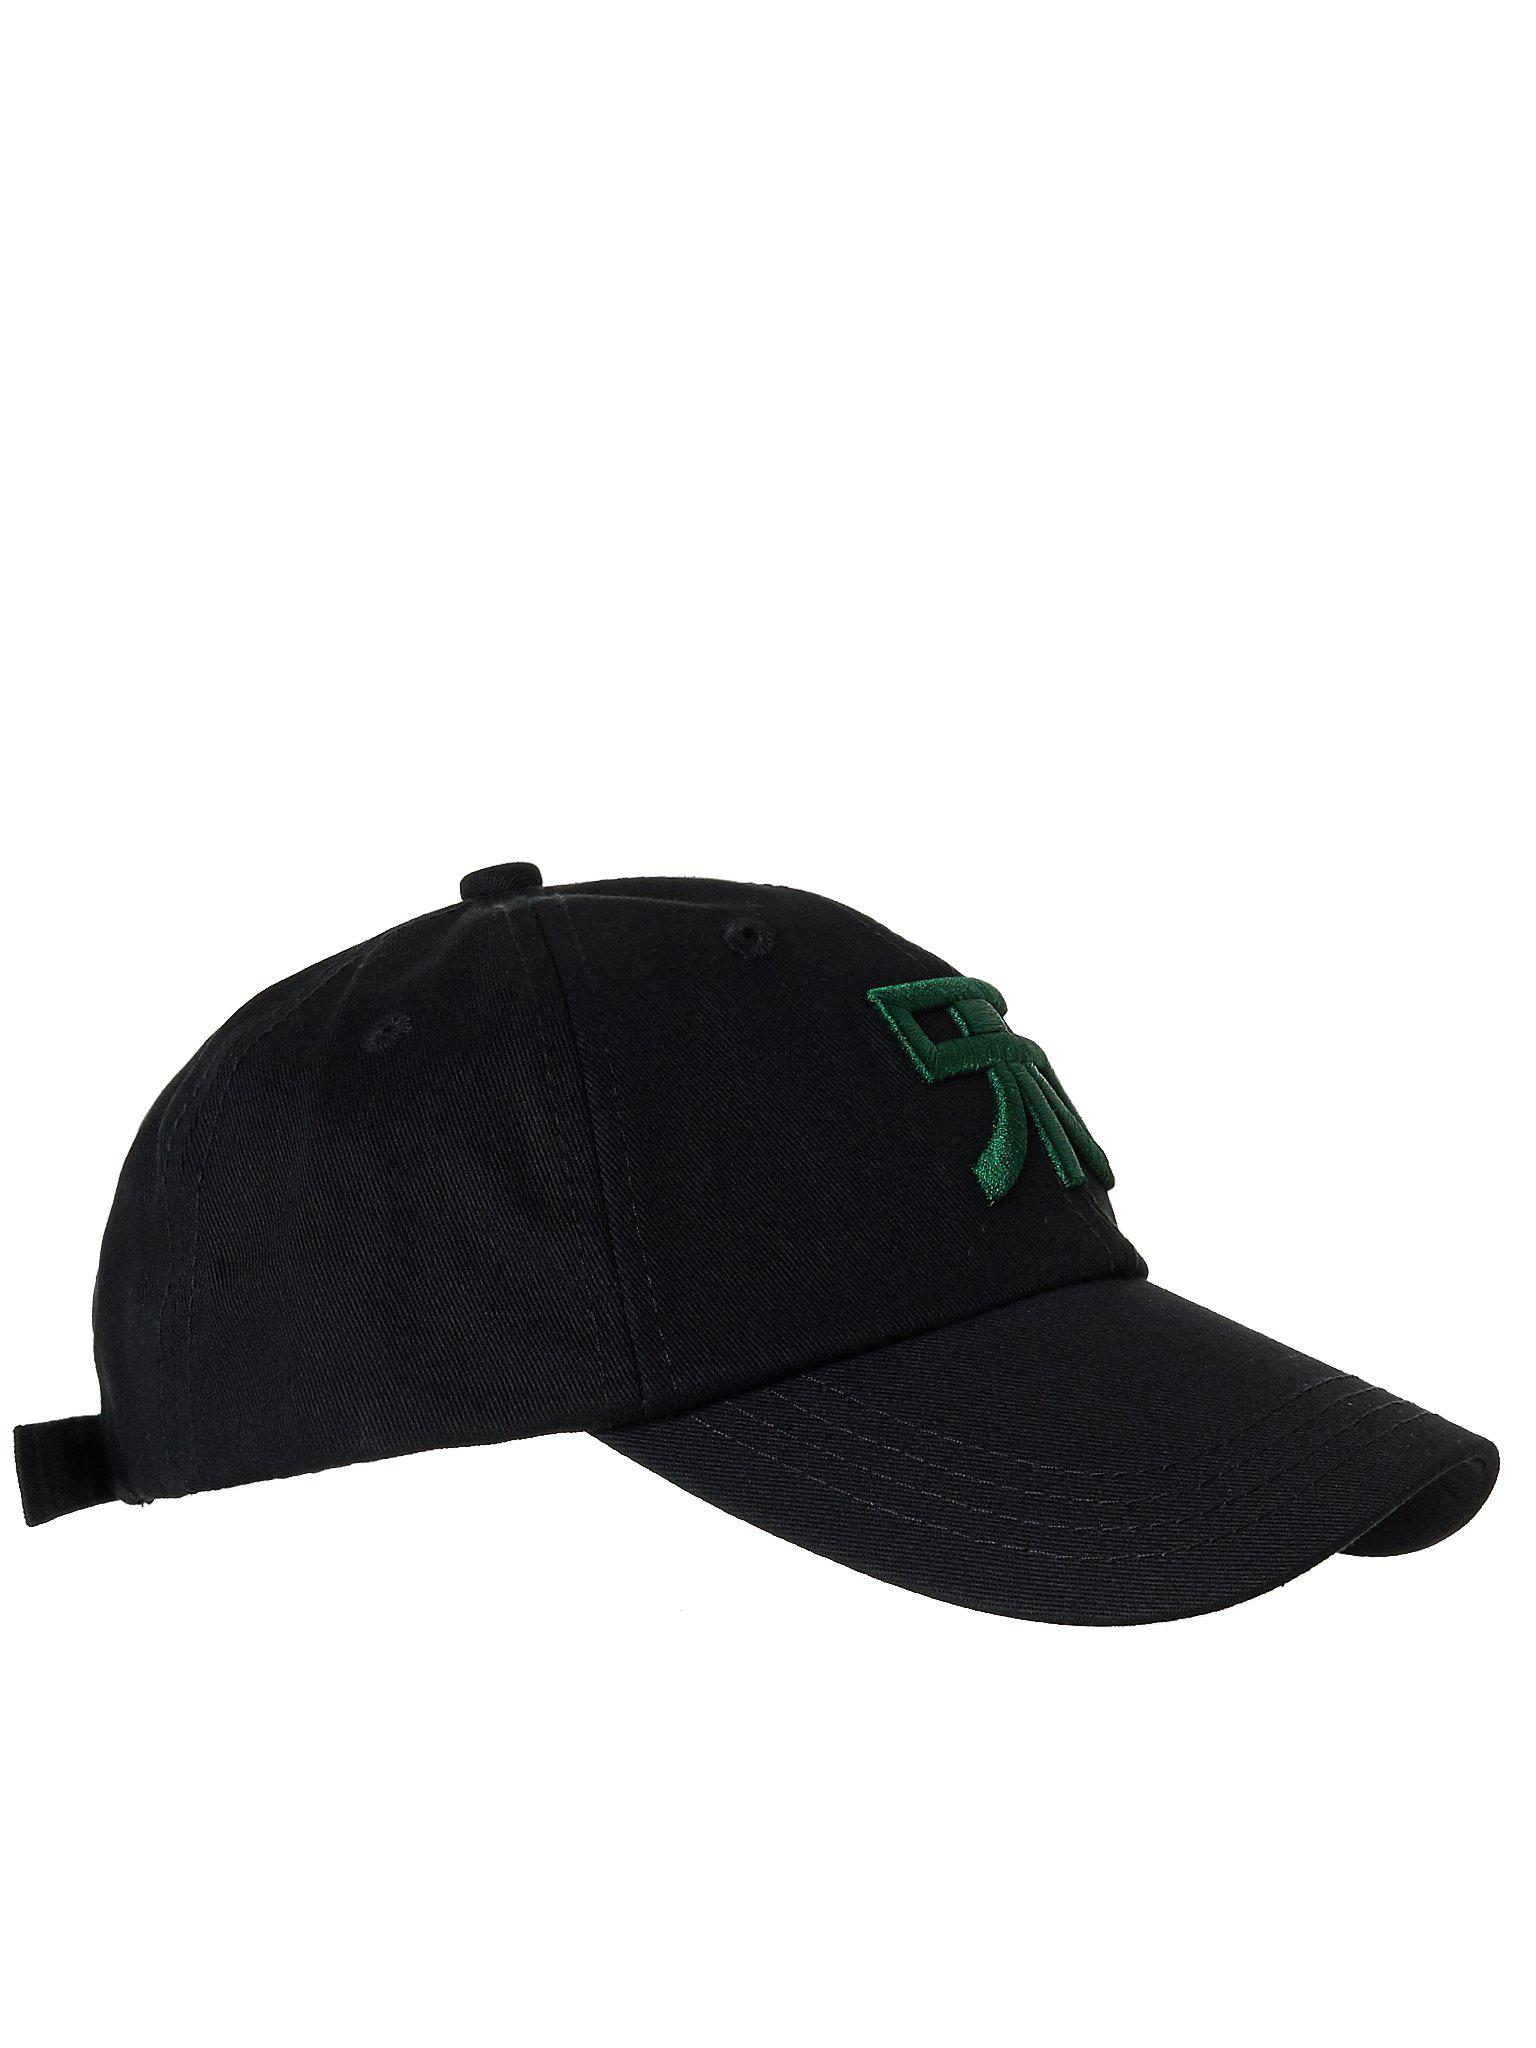 14d3cf1b2d2c6 Lyst - Raf Simons Embroidered Logo Cap in Black for Men